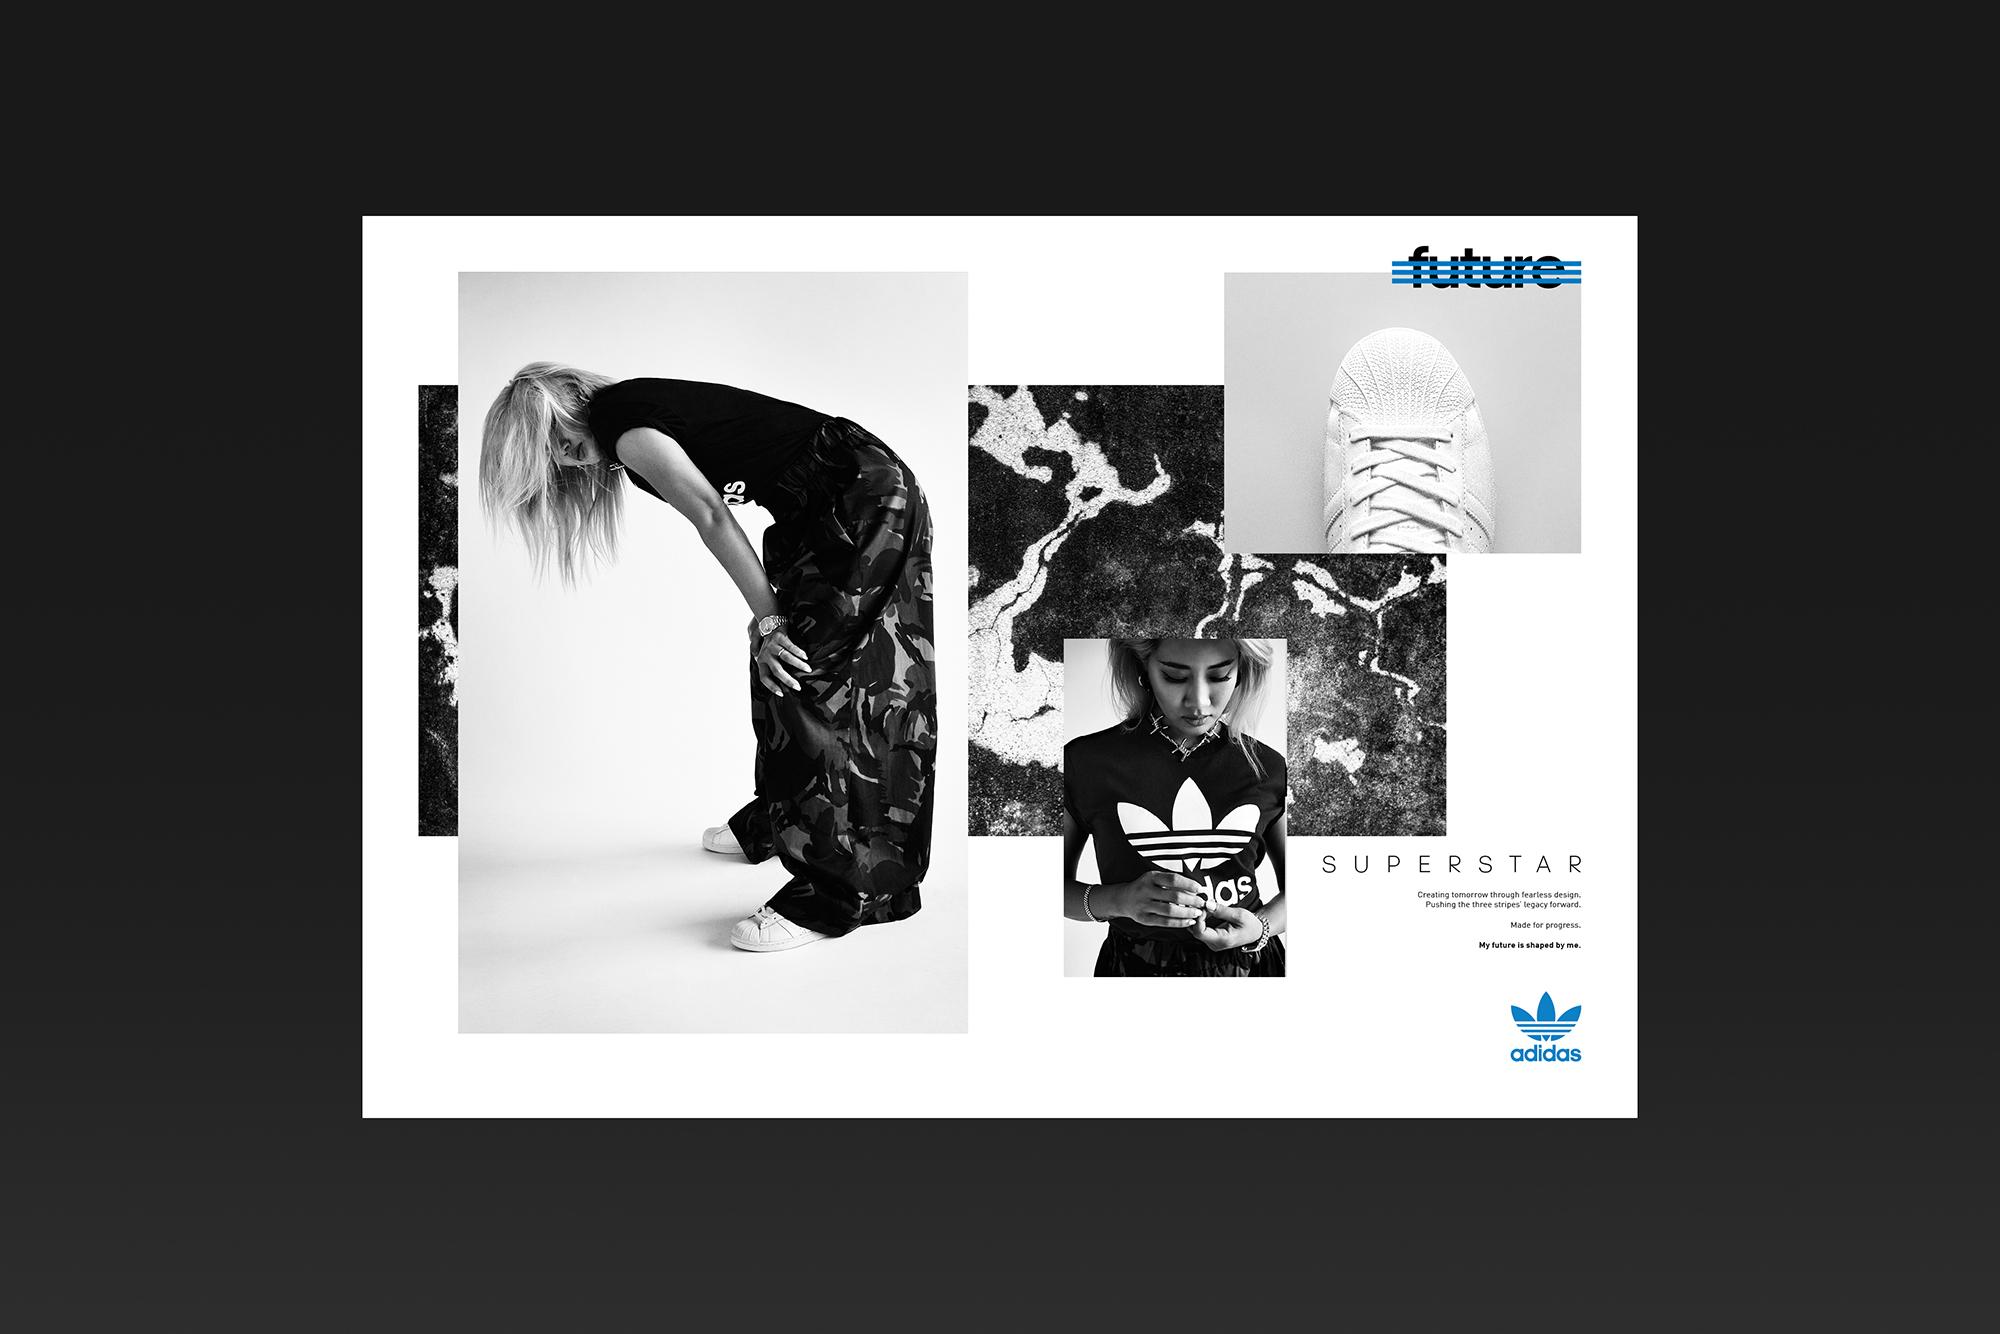 Adidas_SS16_Examples_04.jpg